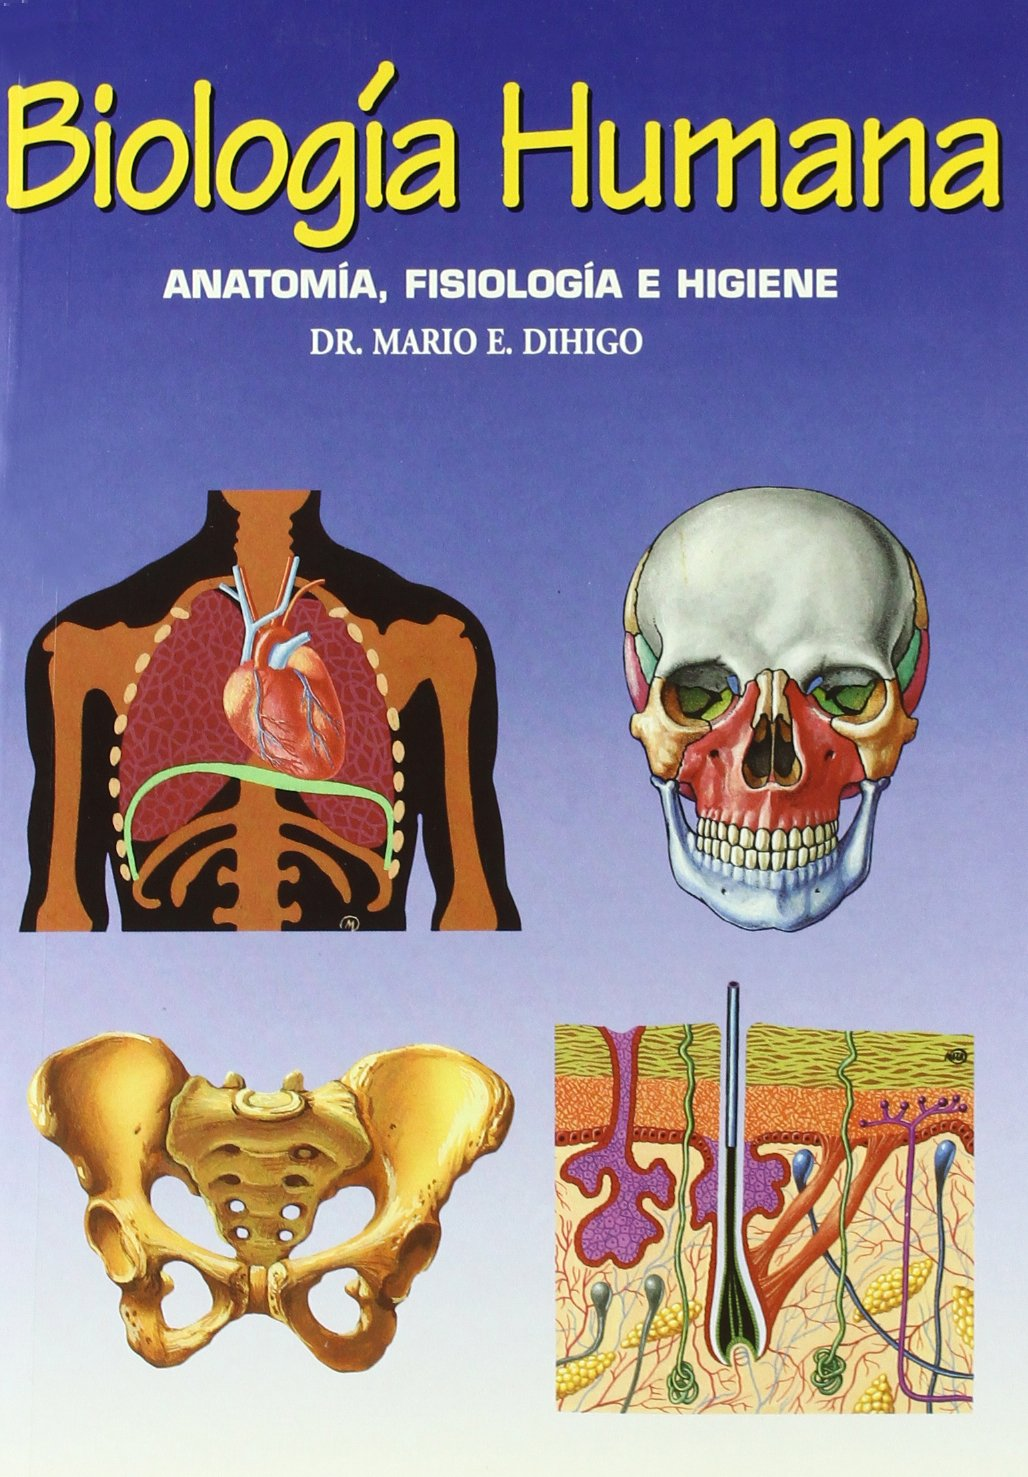 Biologia humana / Human Biology: Anatomia, Fisiologia E Higiene ...